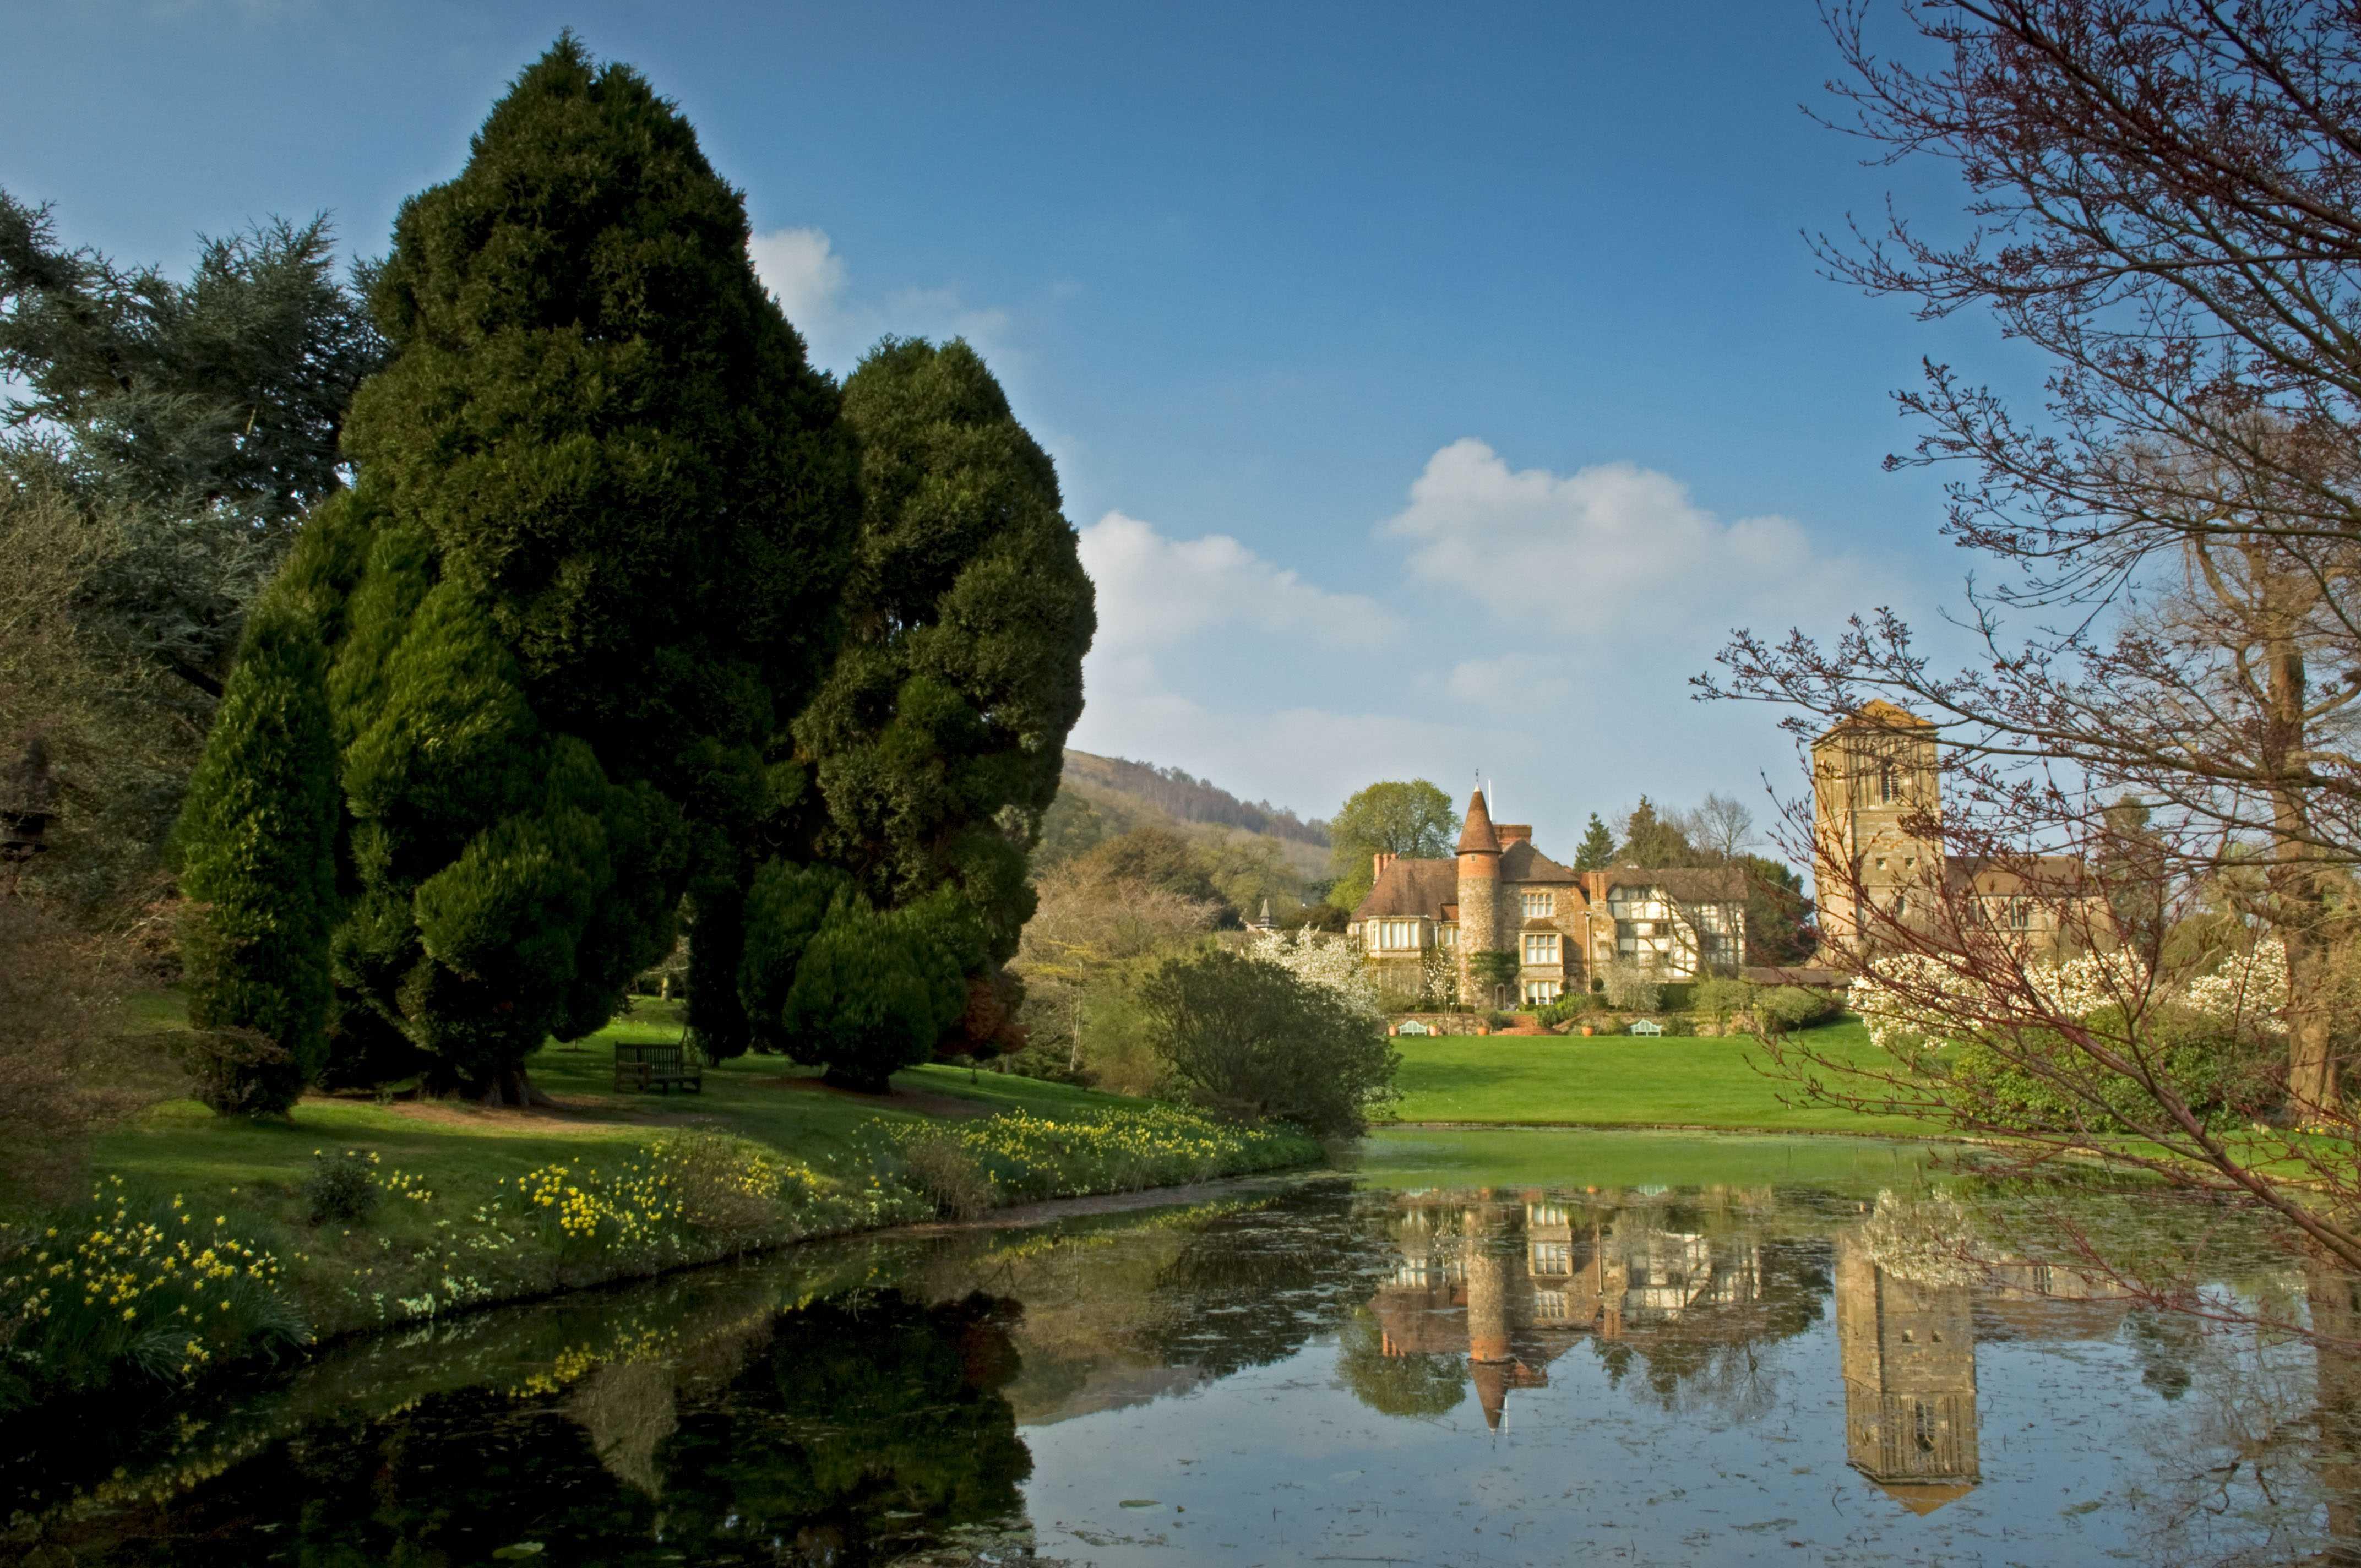 Little Malvern Court and Gardens, Worcestershire, England